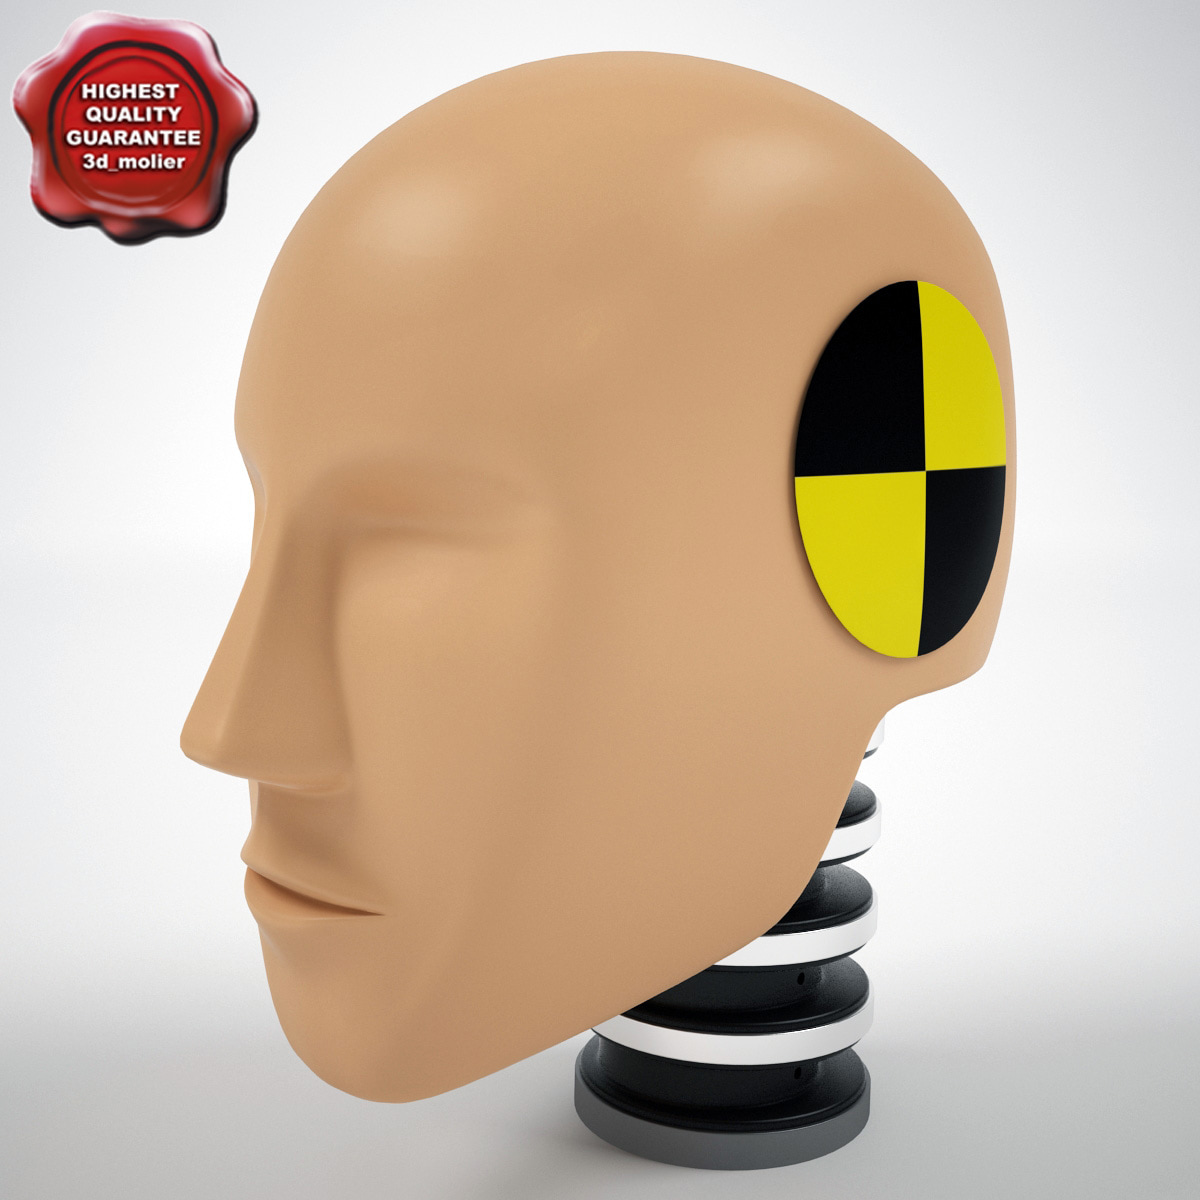 Crash_Test_Dummy_Hibrid_3_Head_00.jpg